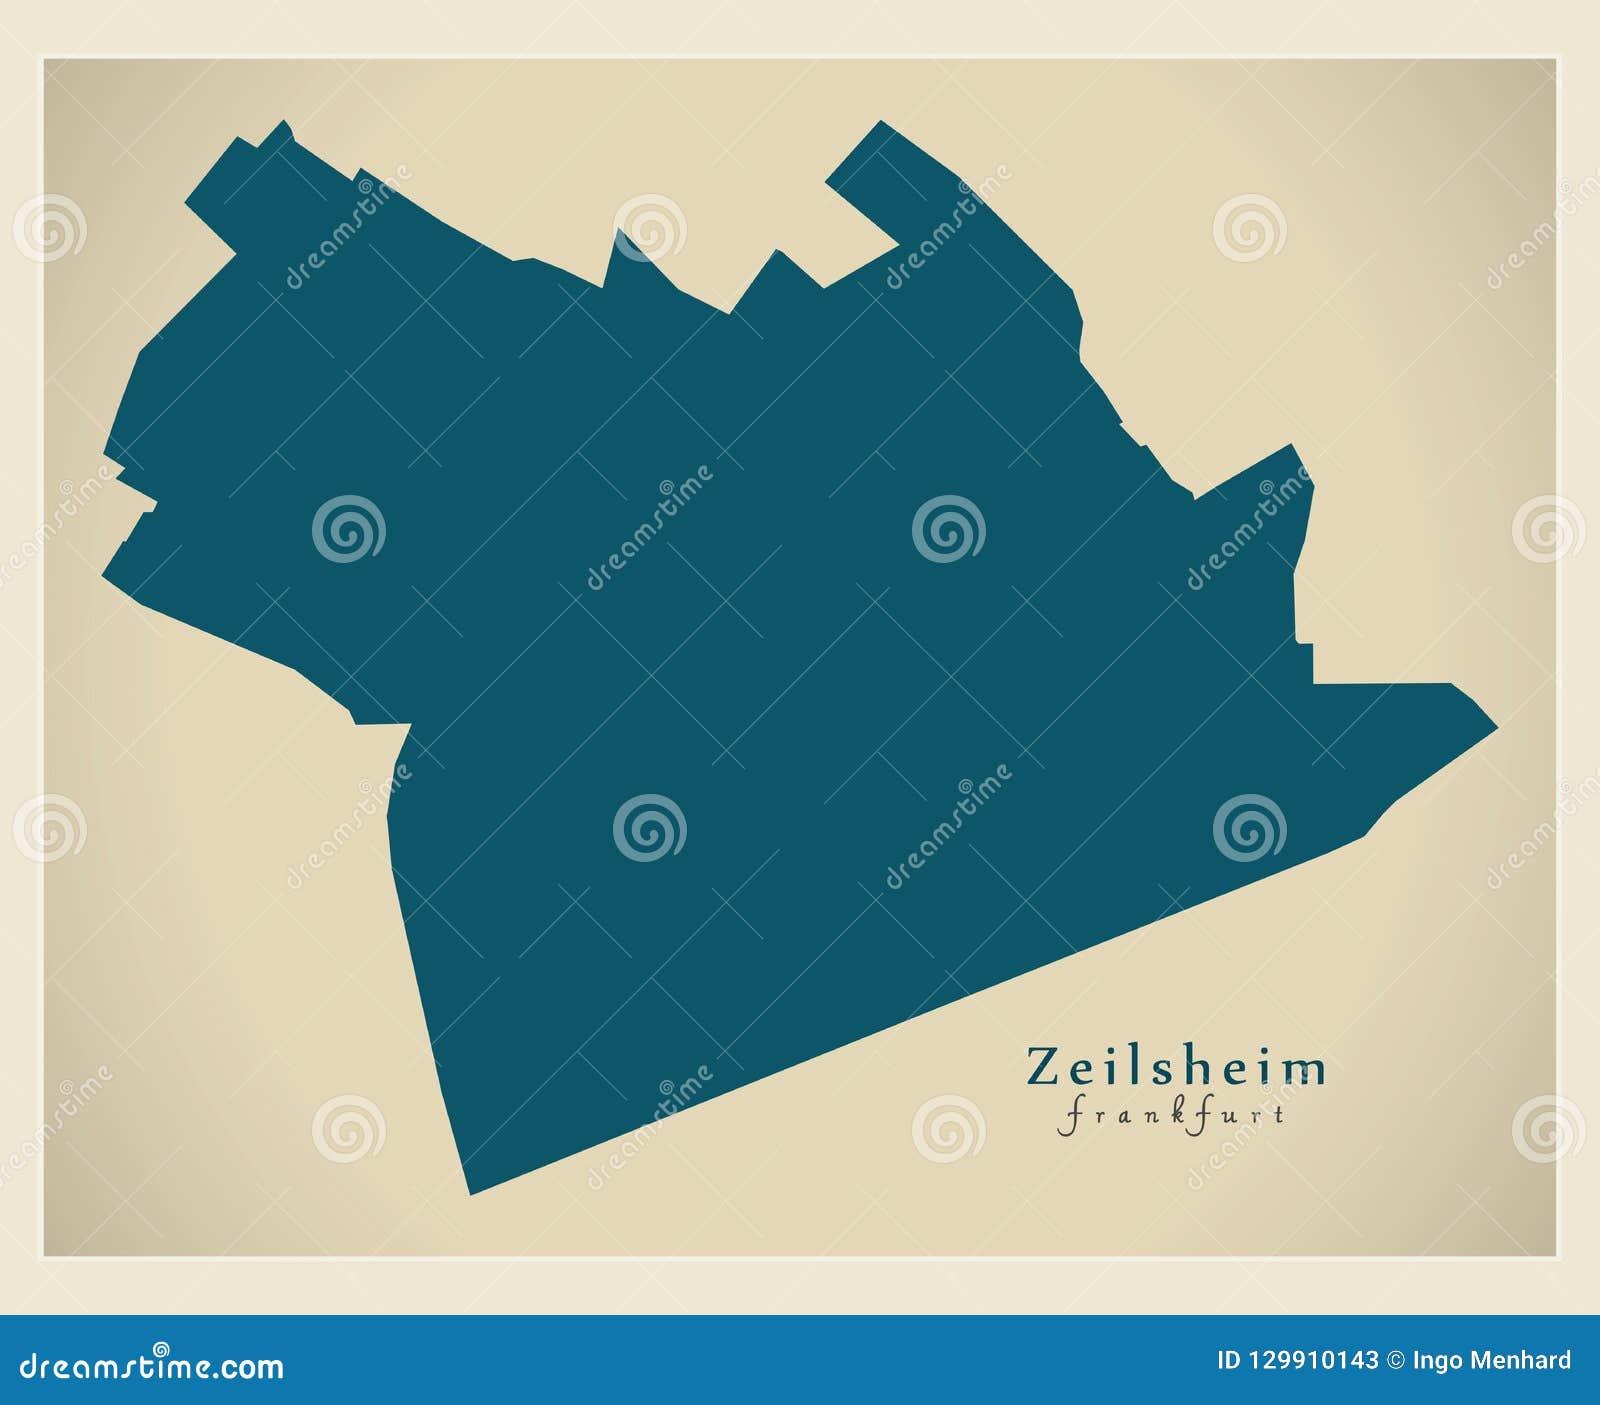 Modern District Map - Frankfurt Zeilsheim Germany Stock Illustration ...